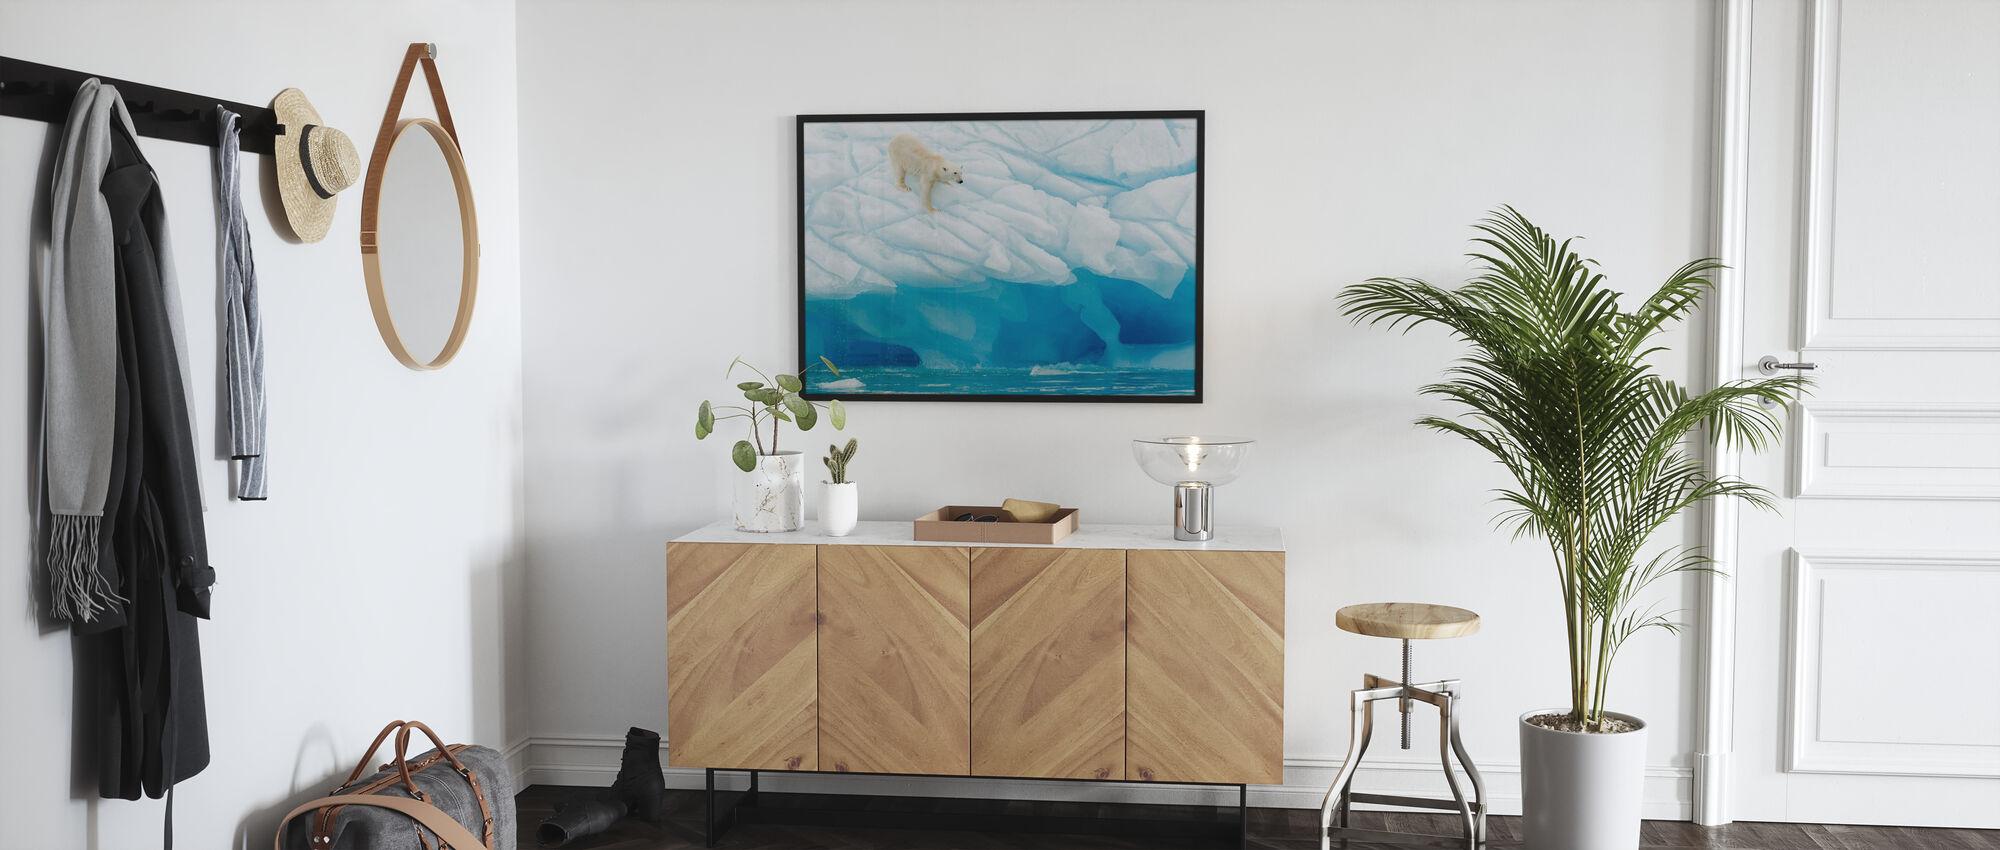 Leaning Polar Bear - Poster - Hallway